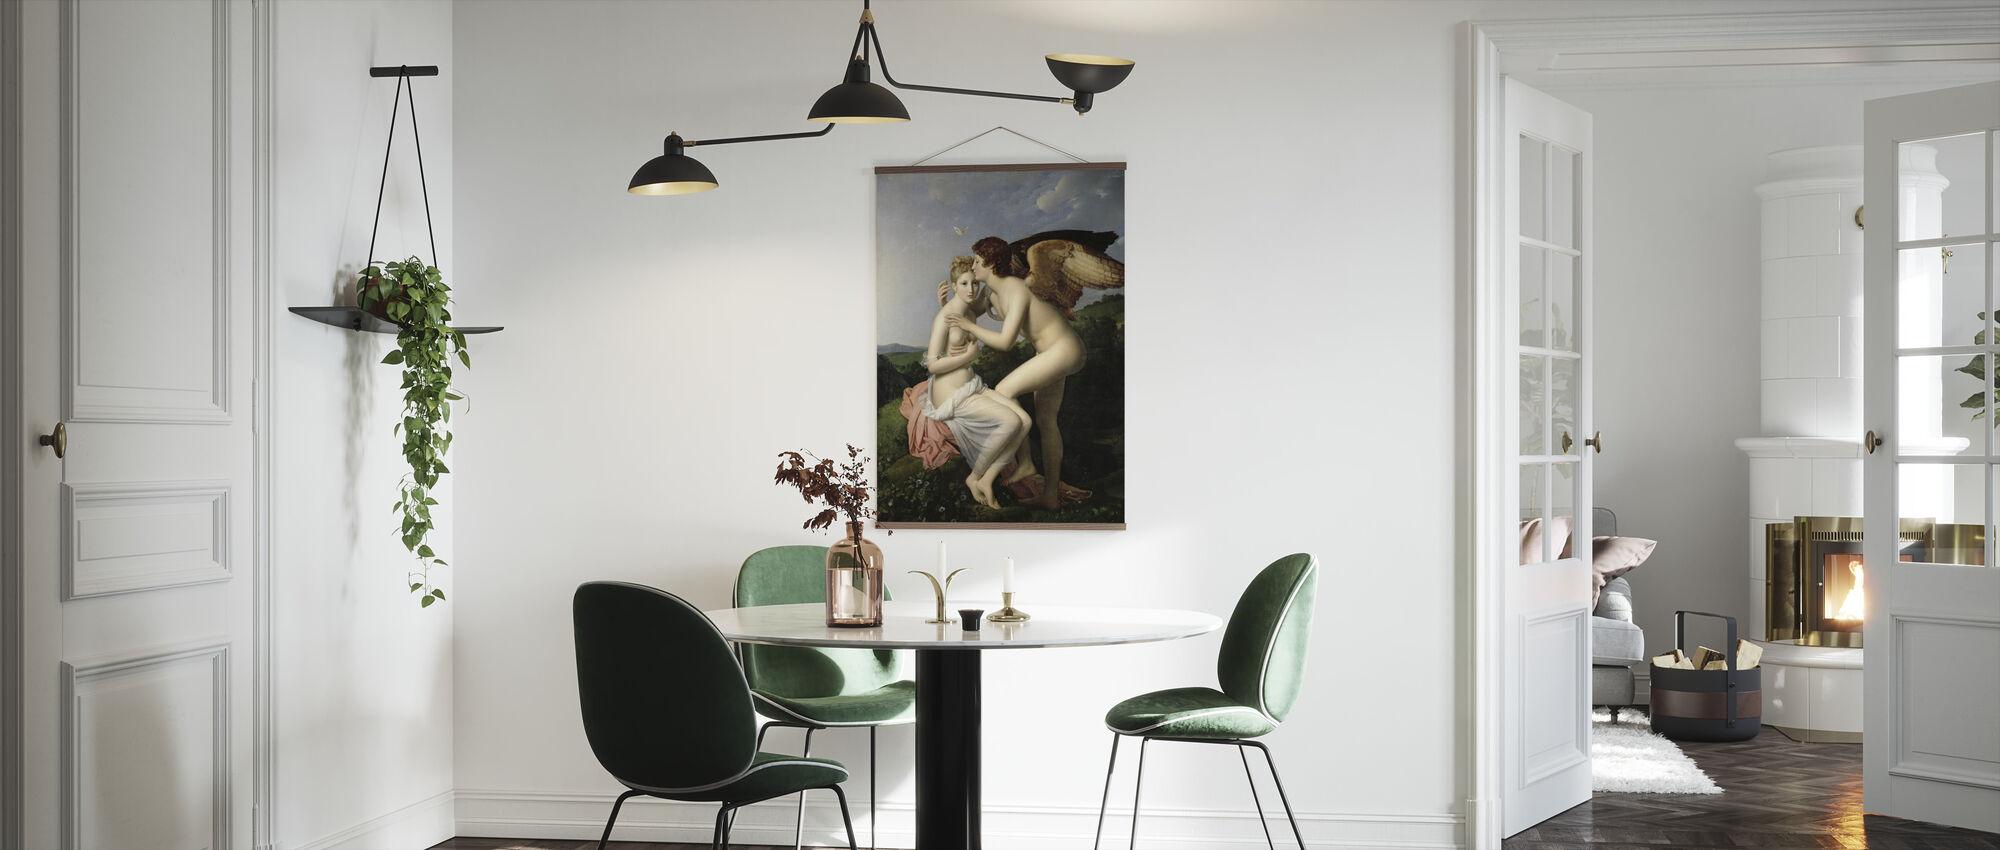 Eerste kus van Cupido - Francois Pascal Gérard - Poster - Keuken